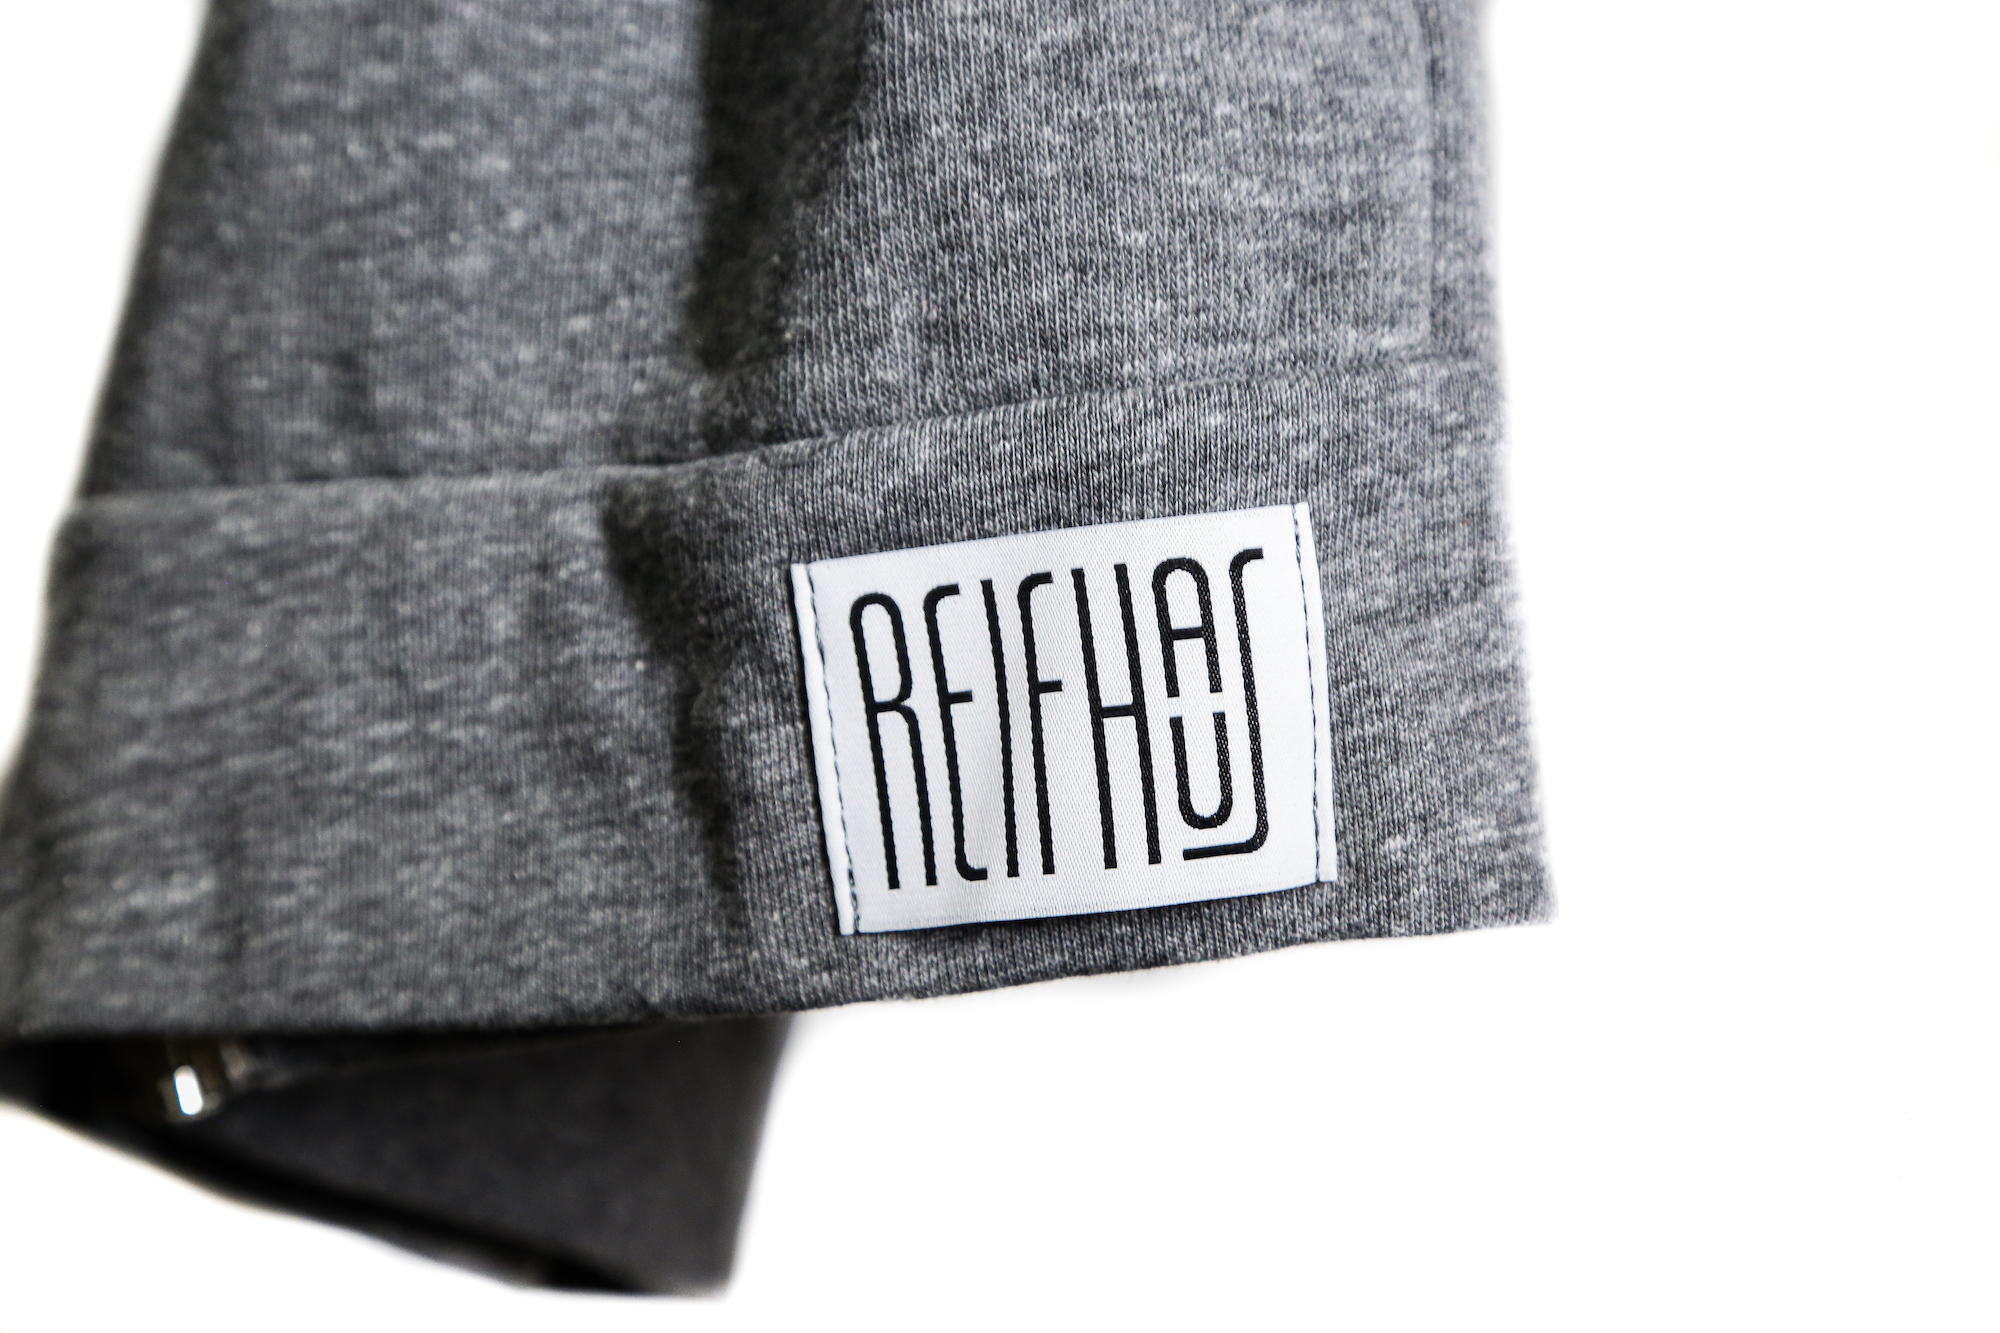 Reifhaus custom woven label